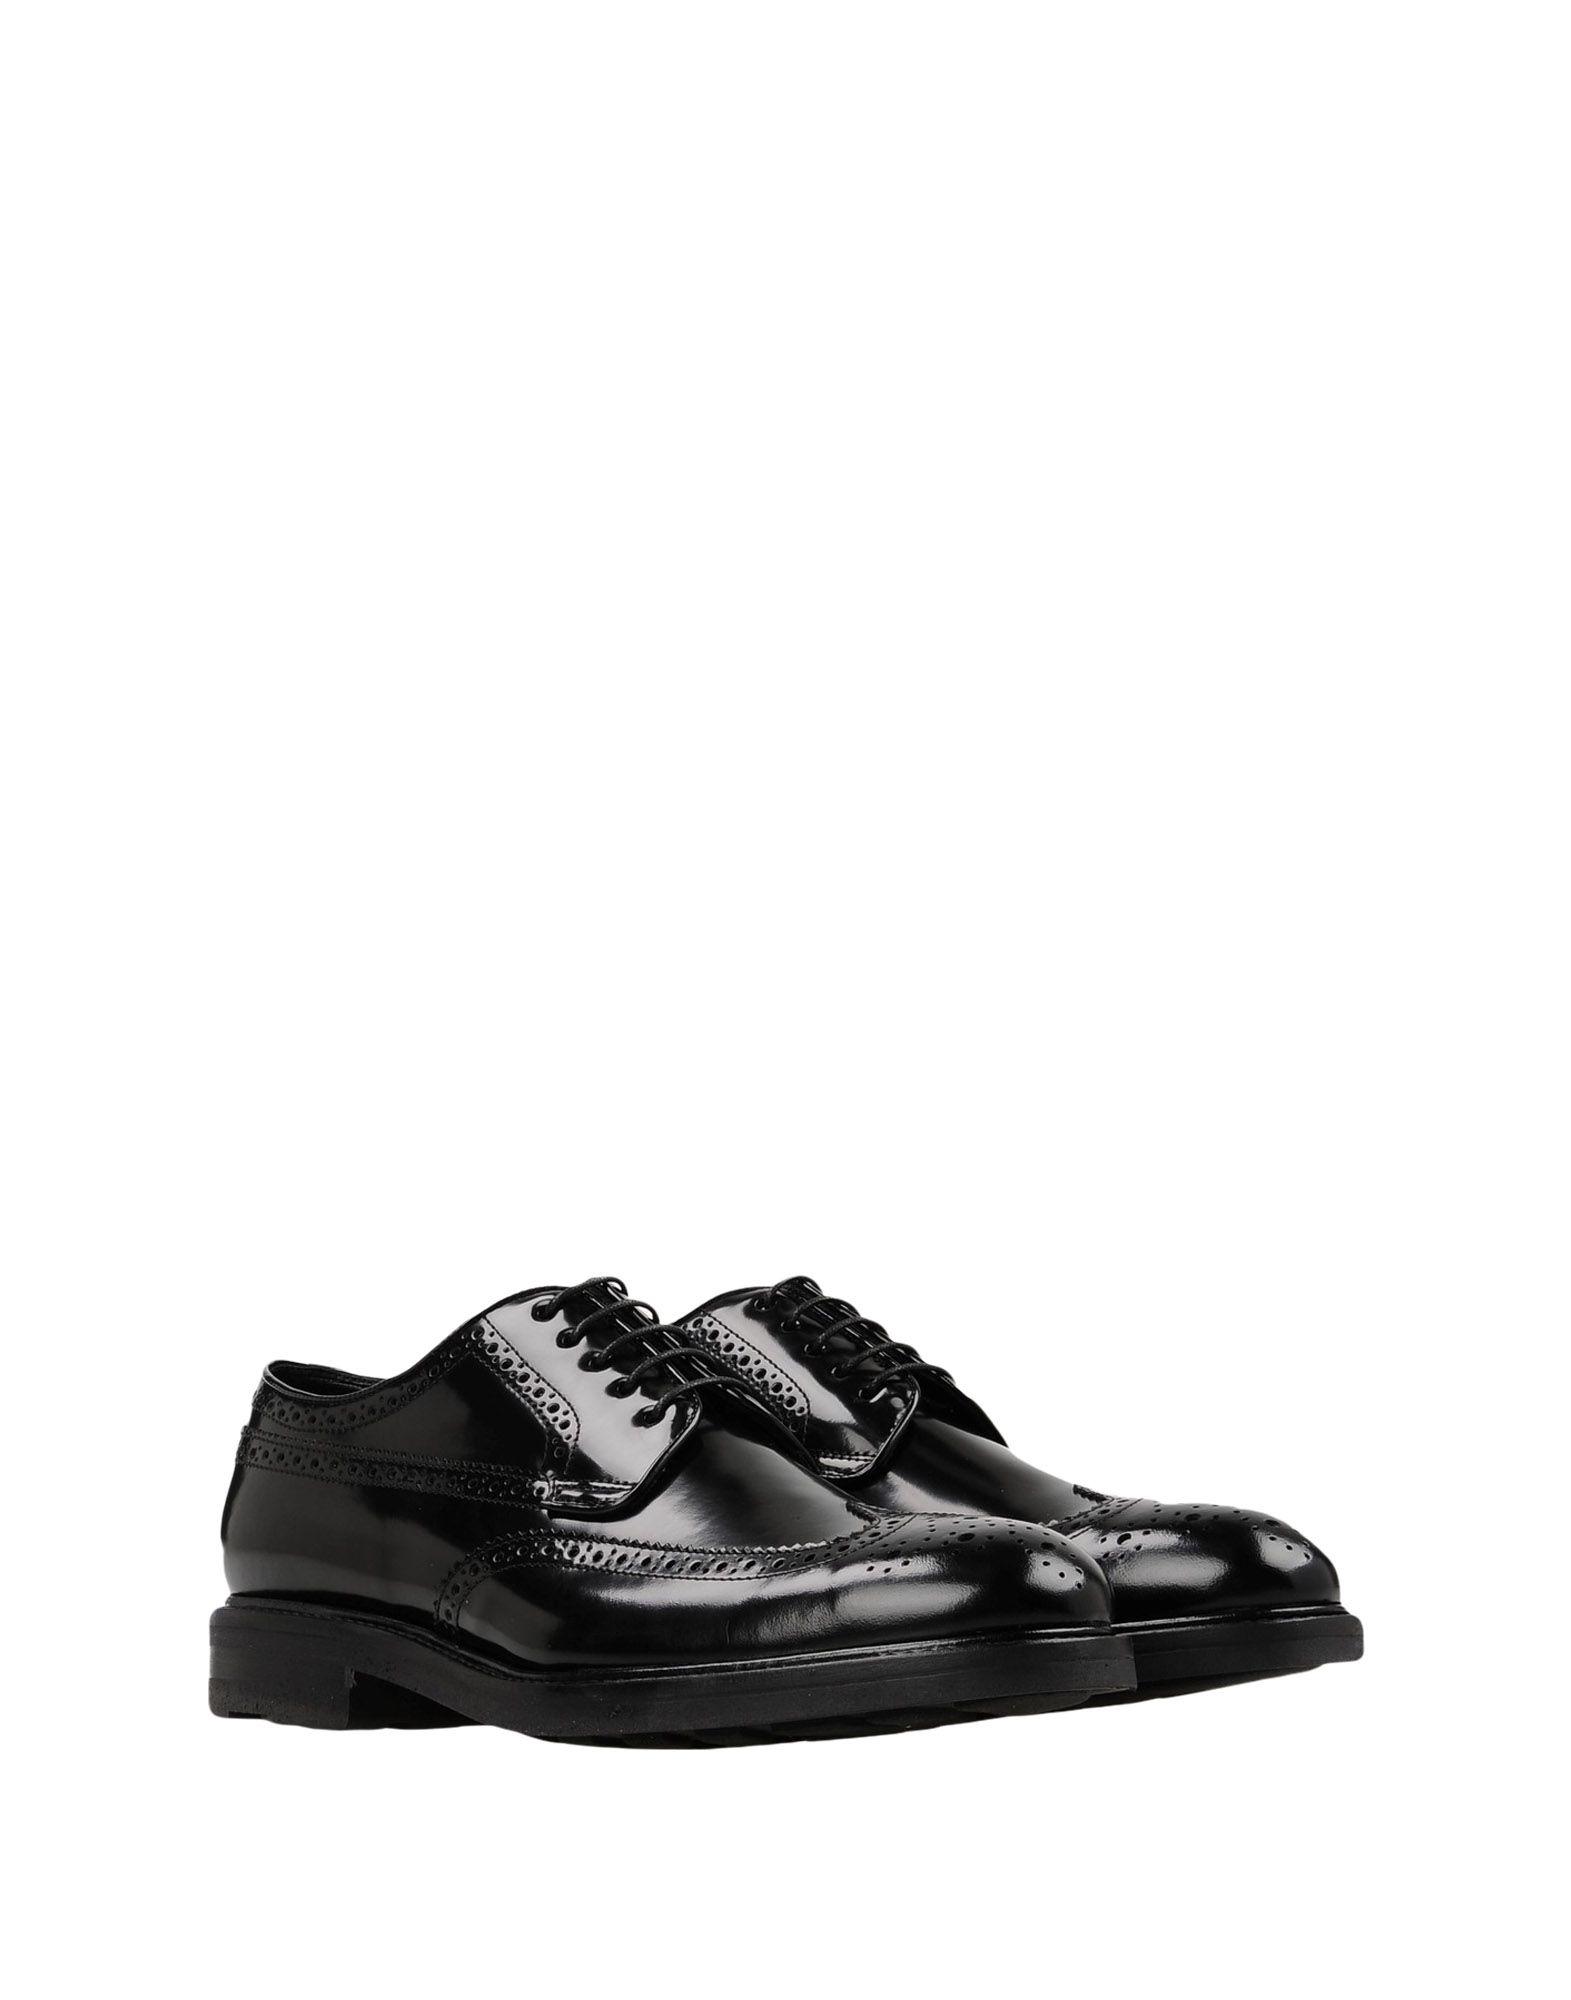 Chaussures À Lacets J. Holbens A157 - Homme - Chaussures À Lacets J. Holbens sur